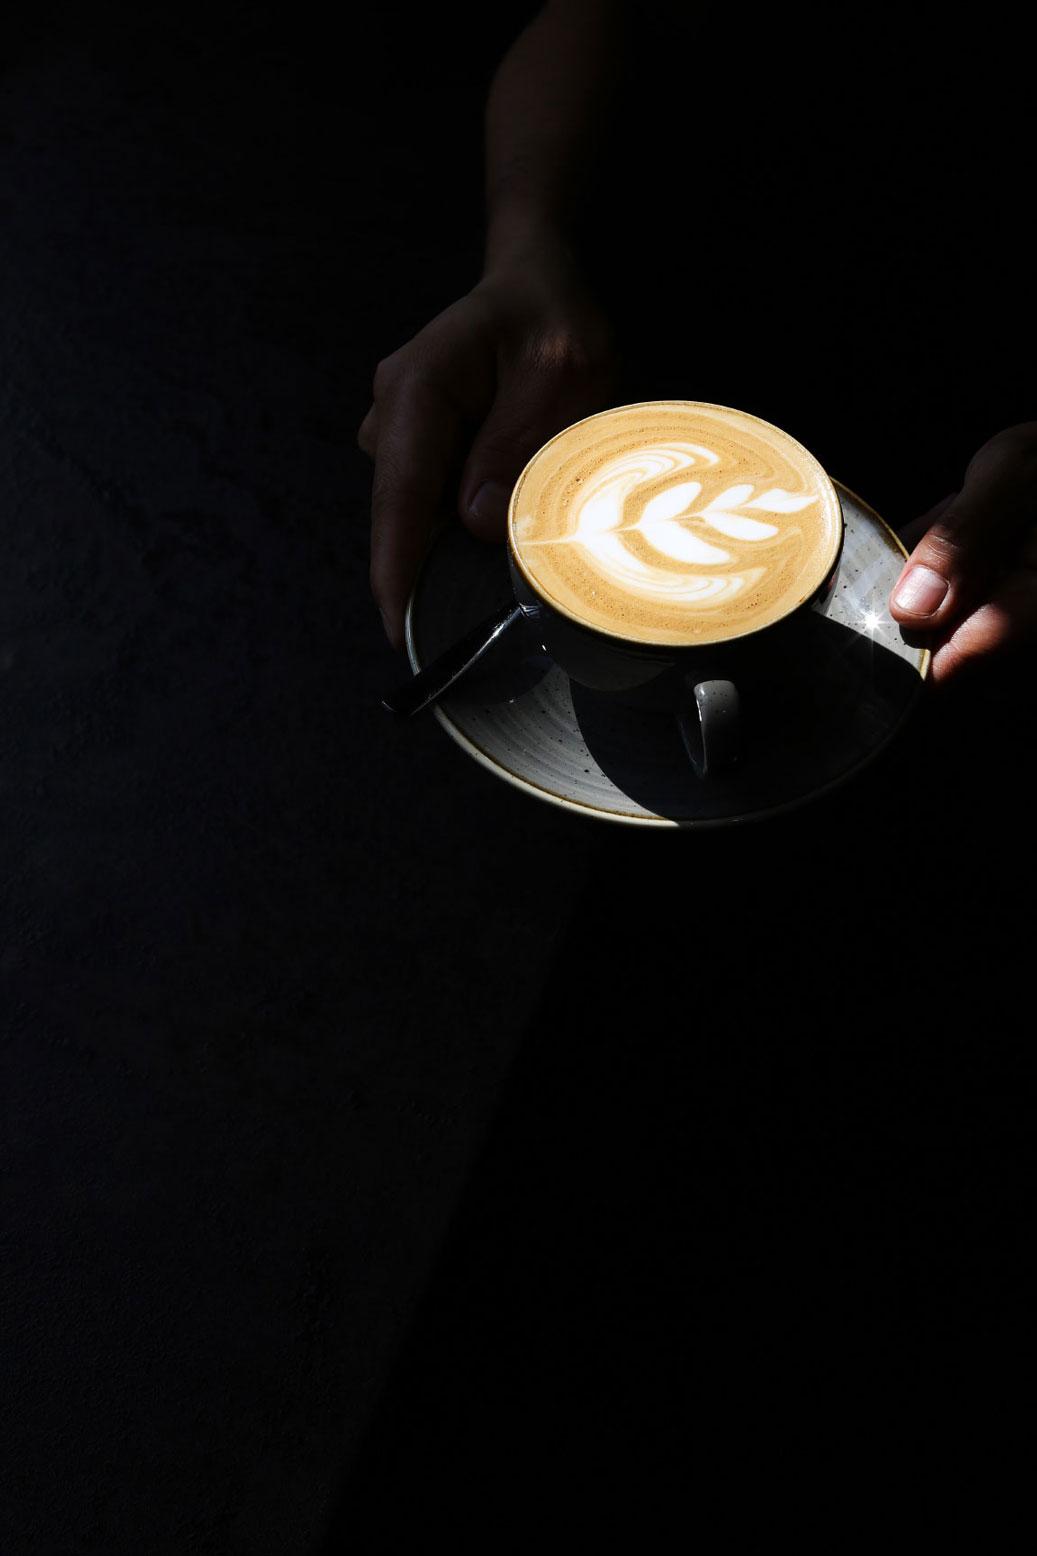 AMONST FEW CAFE